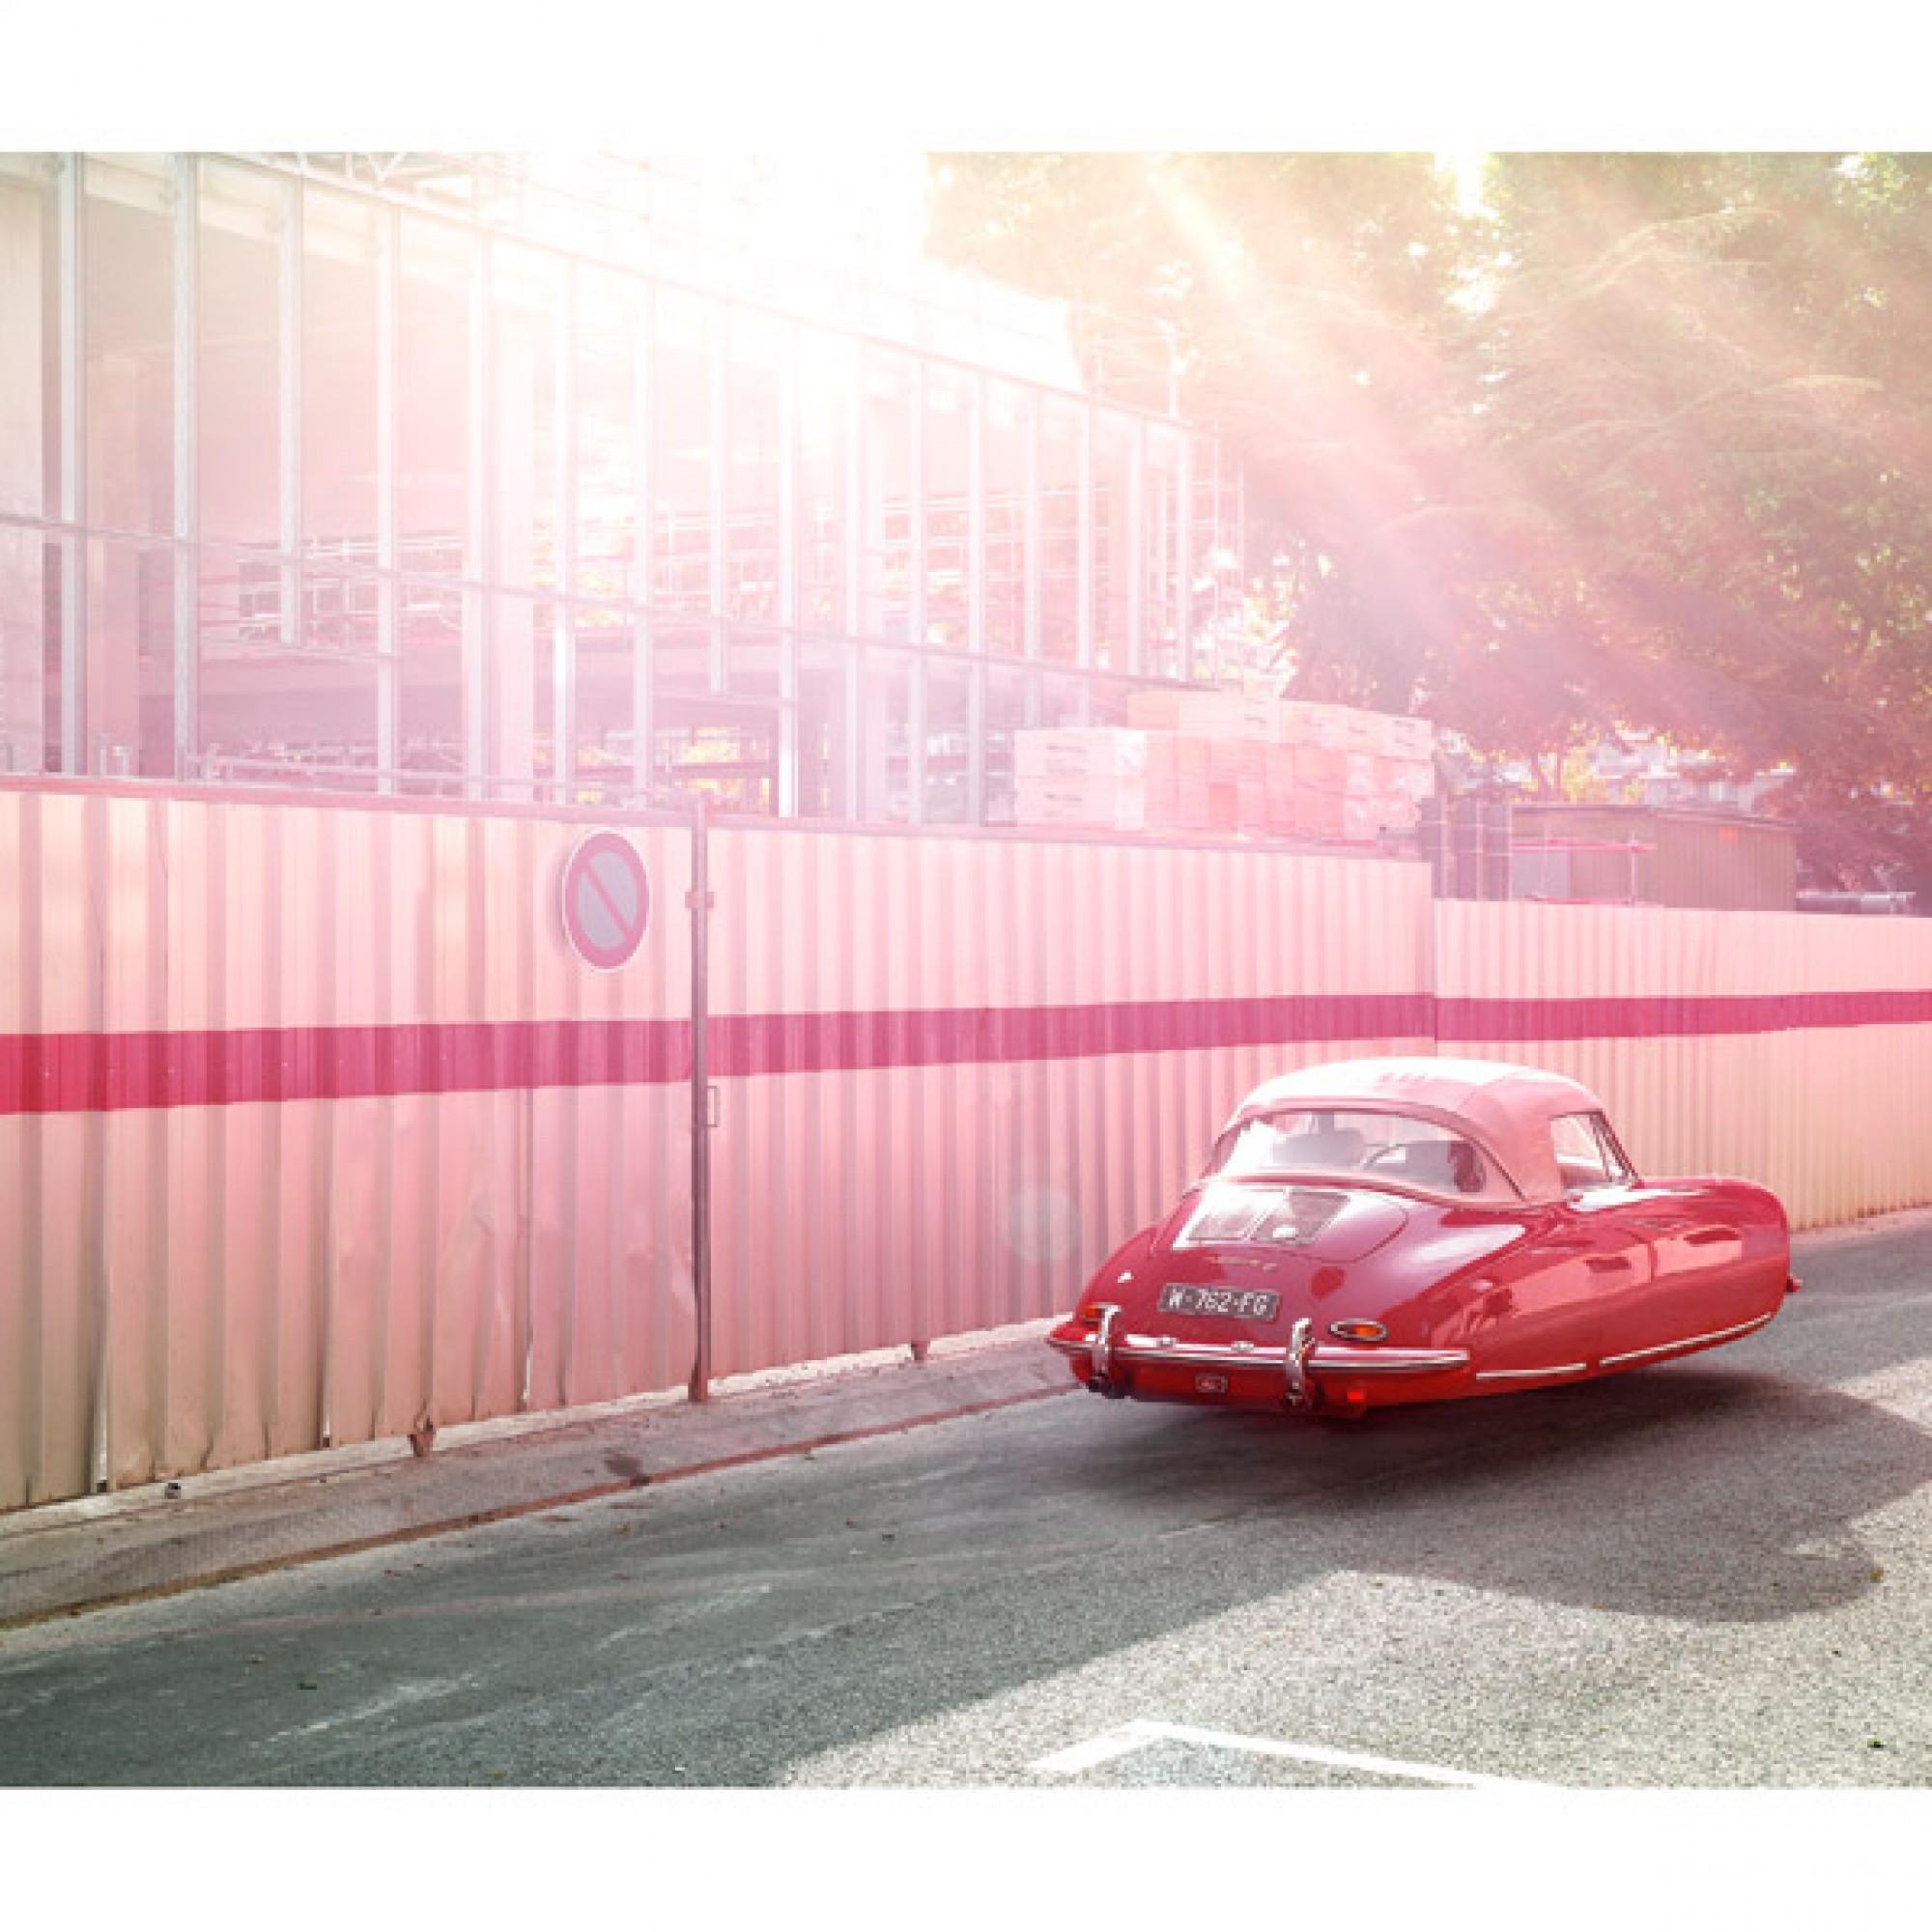 Porsche 365. (Renaud Marion / M.A.D. Gallery / zvg)